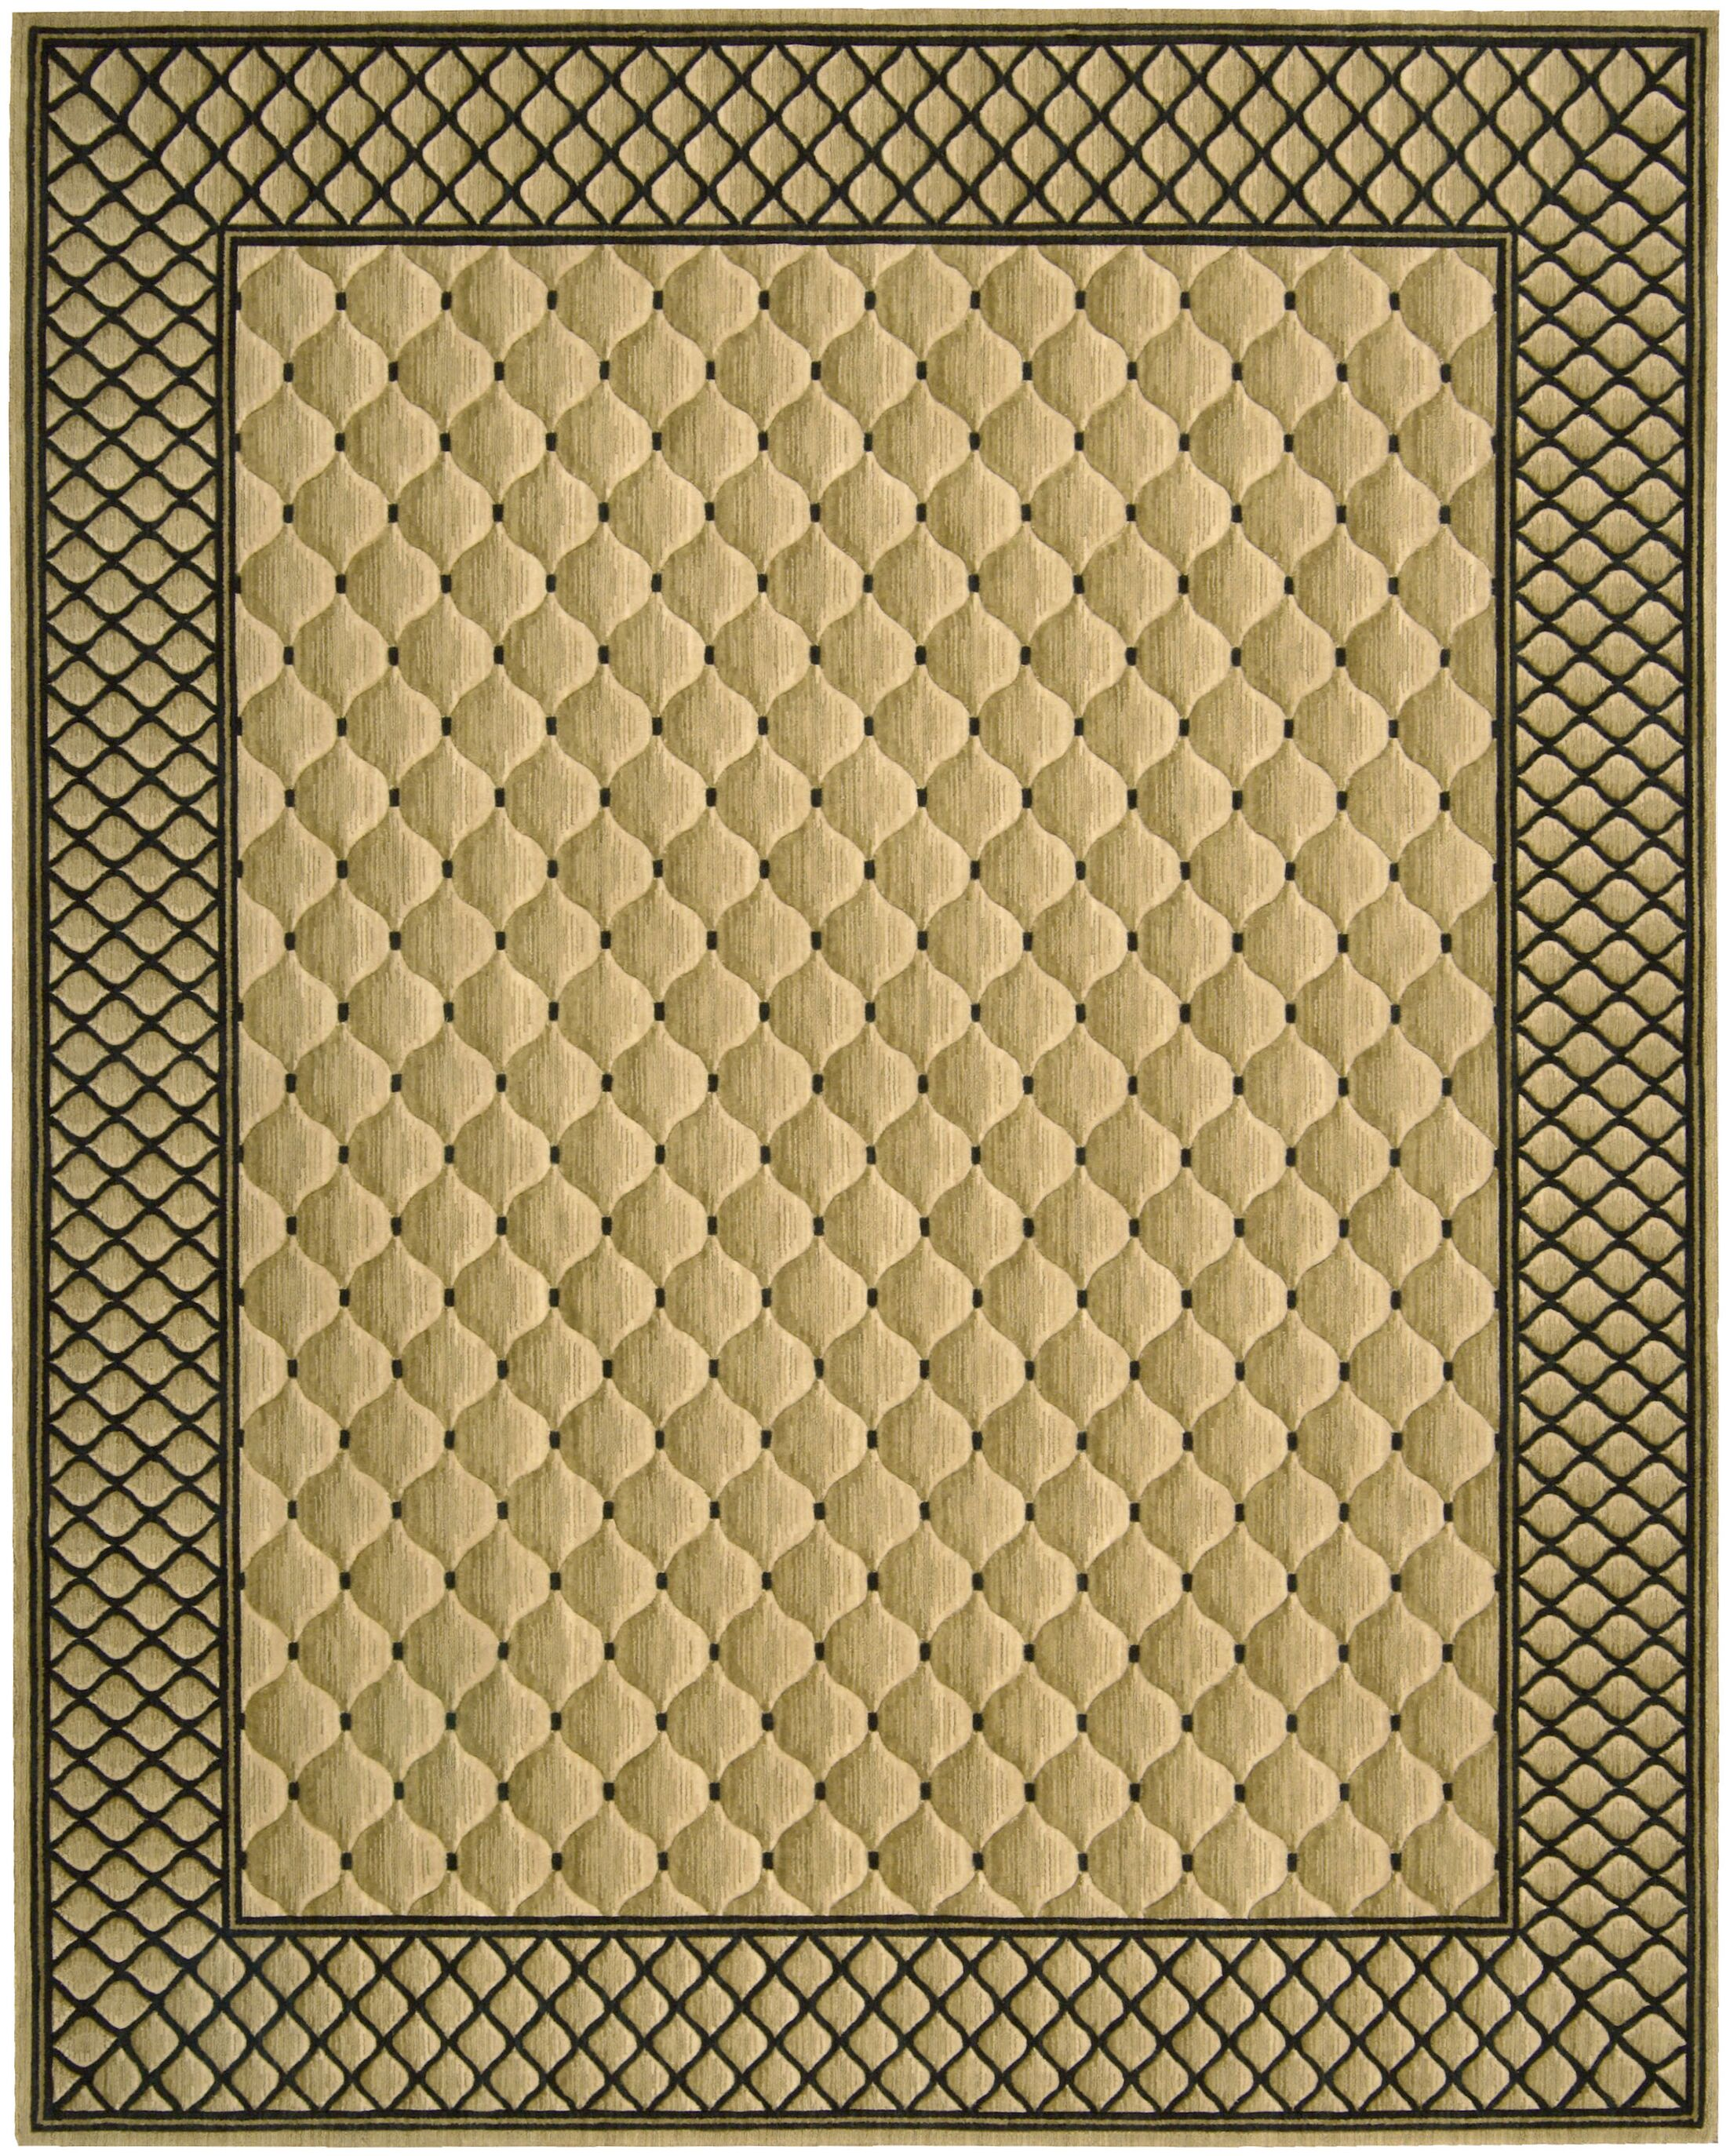 Bryn Beige/Black Area Rug Rug Size: Rectangle 2' x 3'